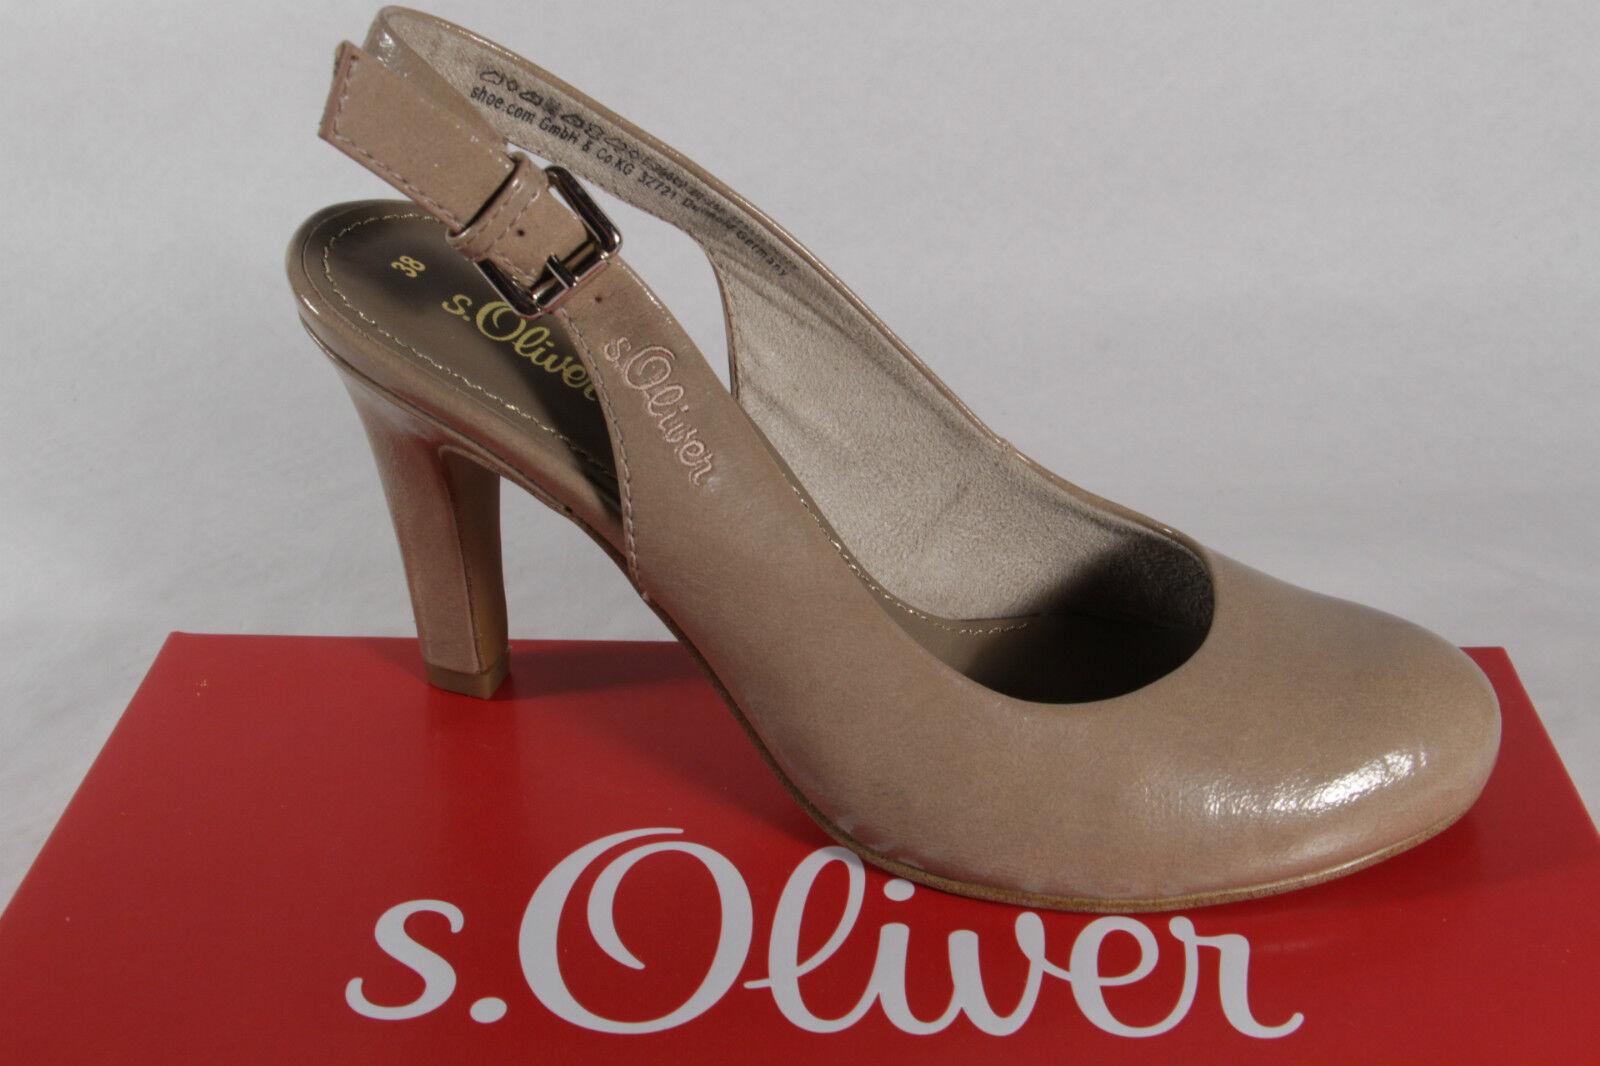 S.Oliver S.Oliver S.Oliver Sling   Sandali, Sabbia Beige, pelle Soletta Interna Nuovo c8e491